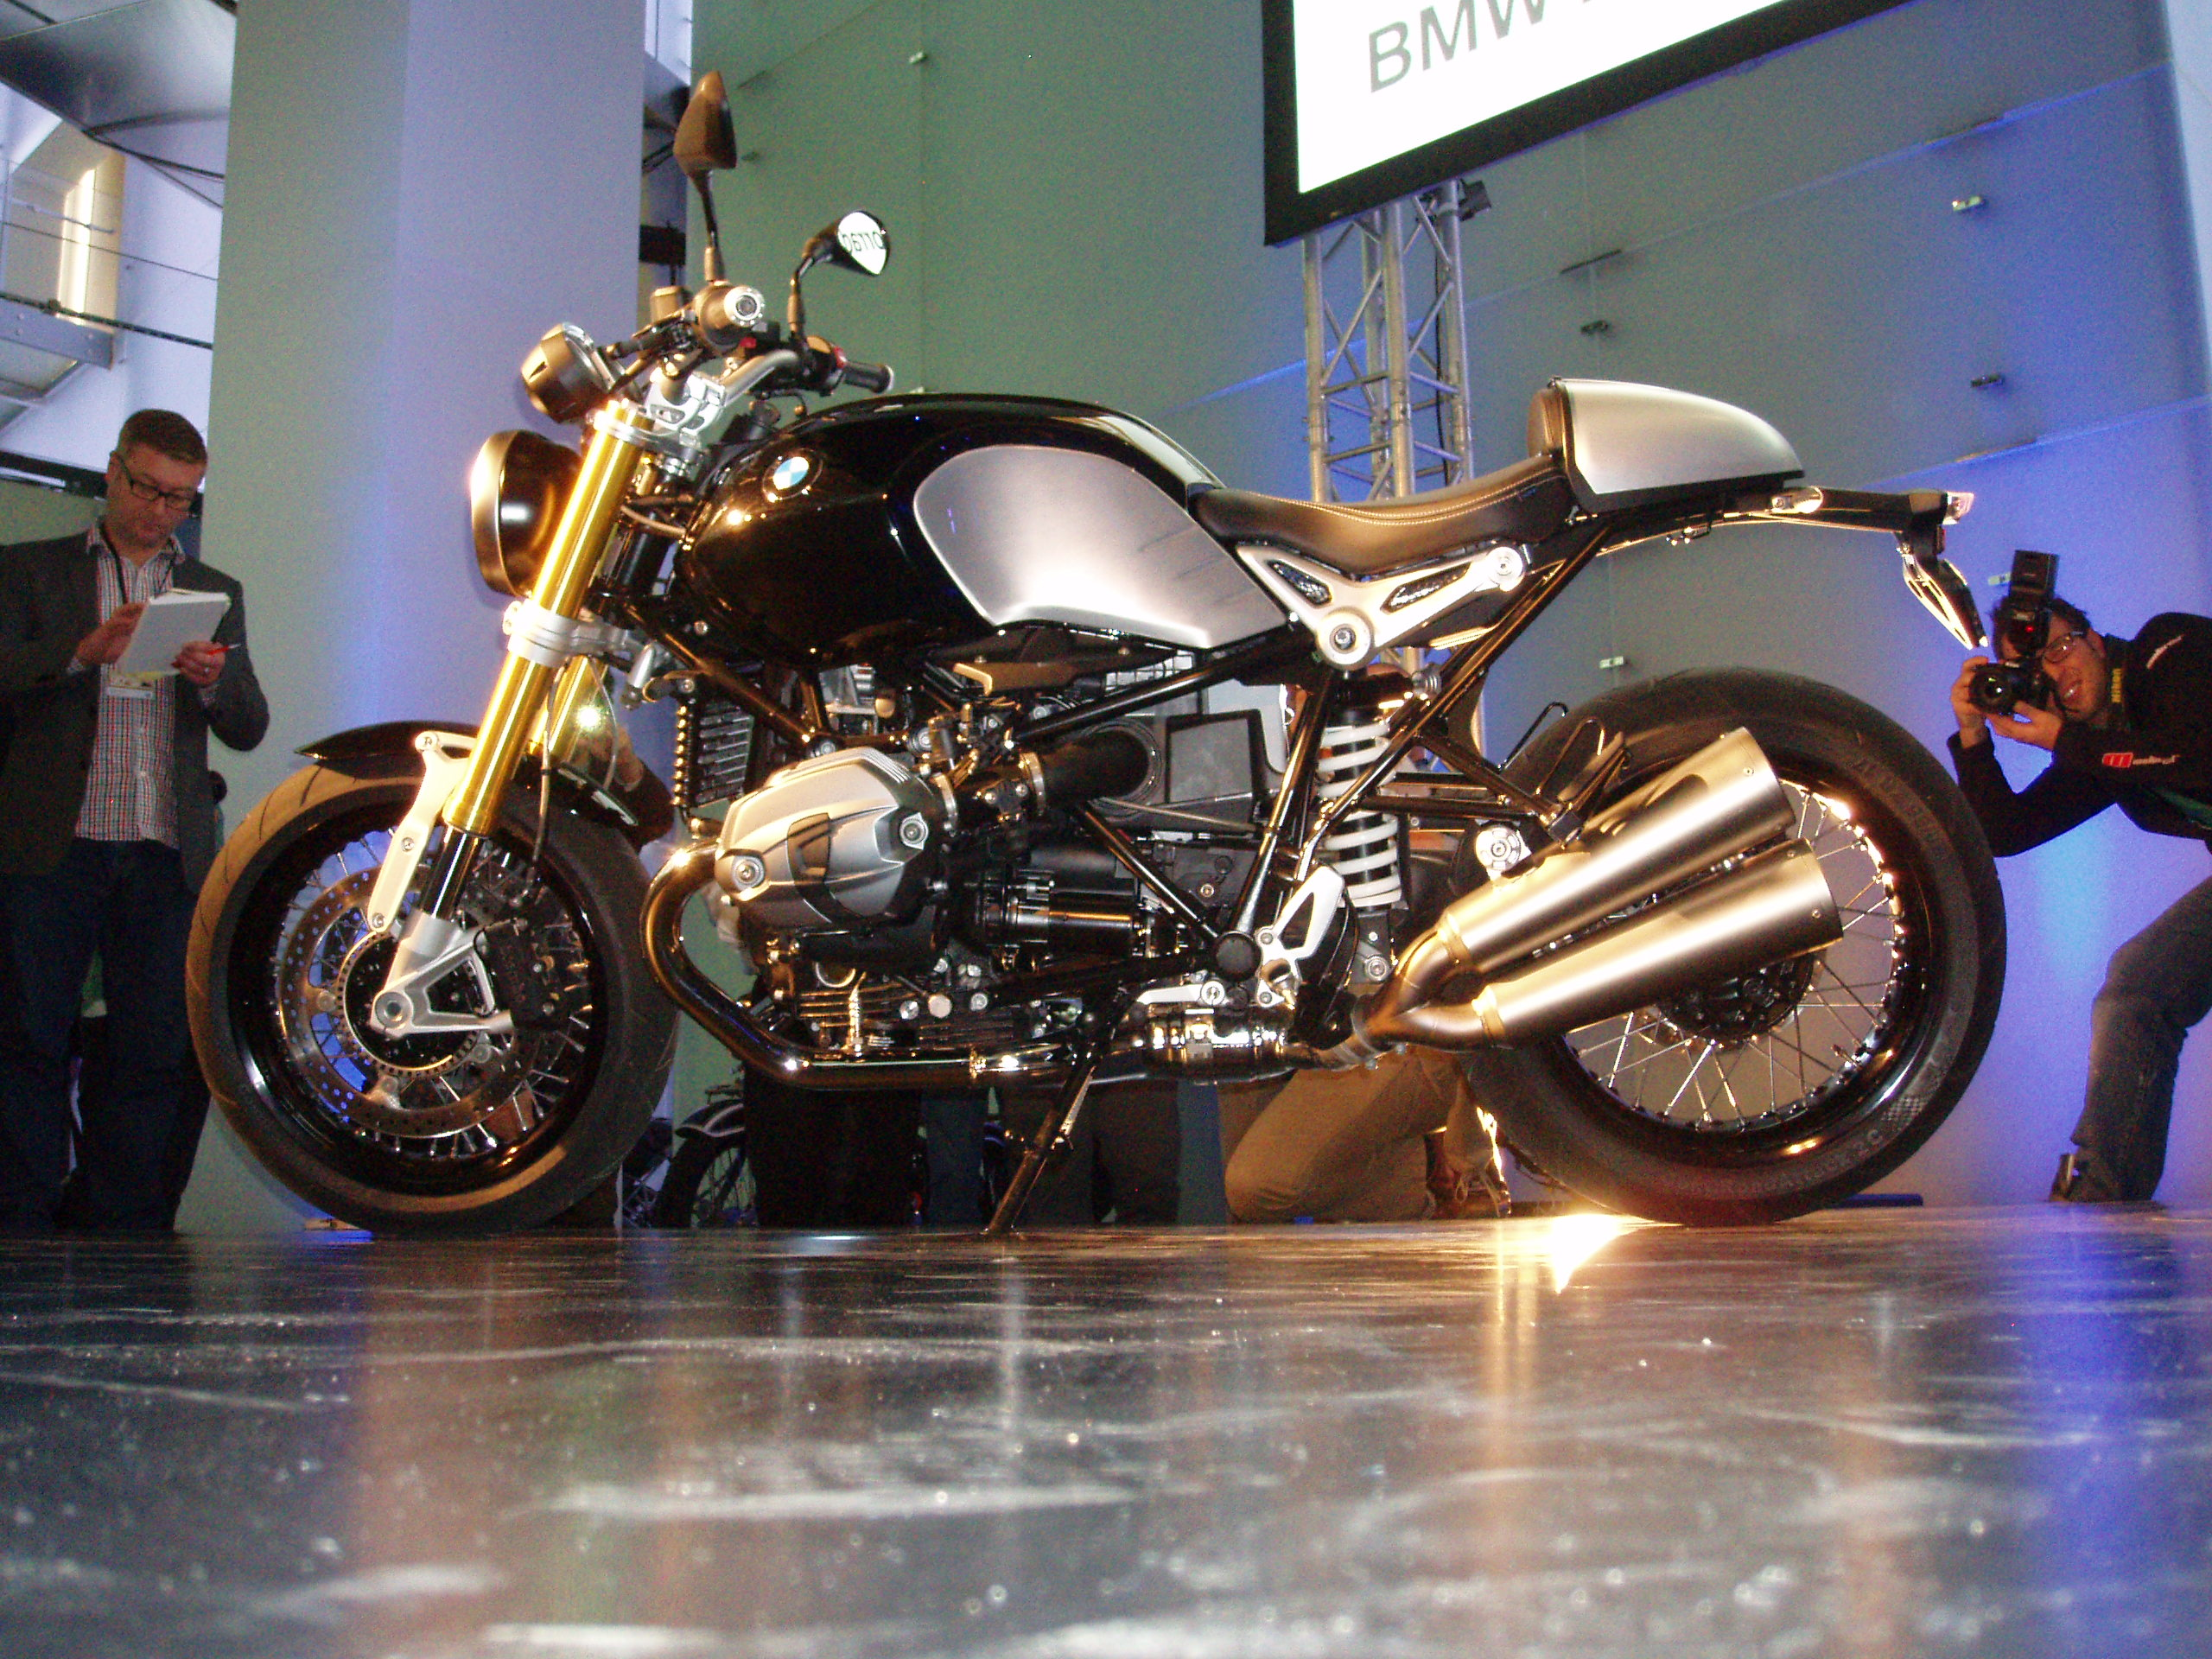 BMW NineT unveiled